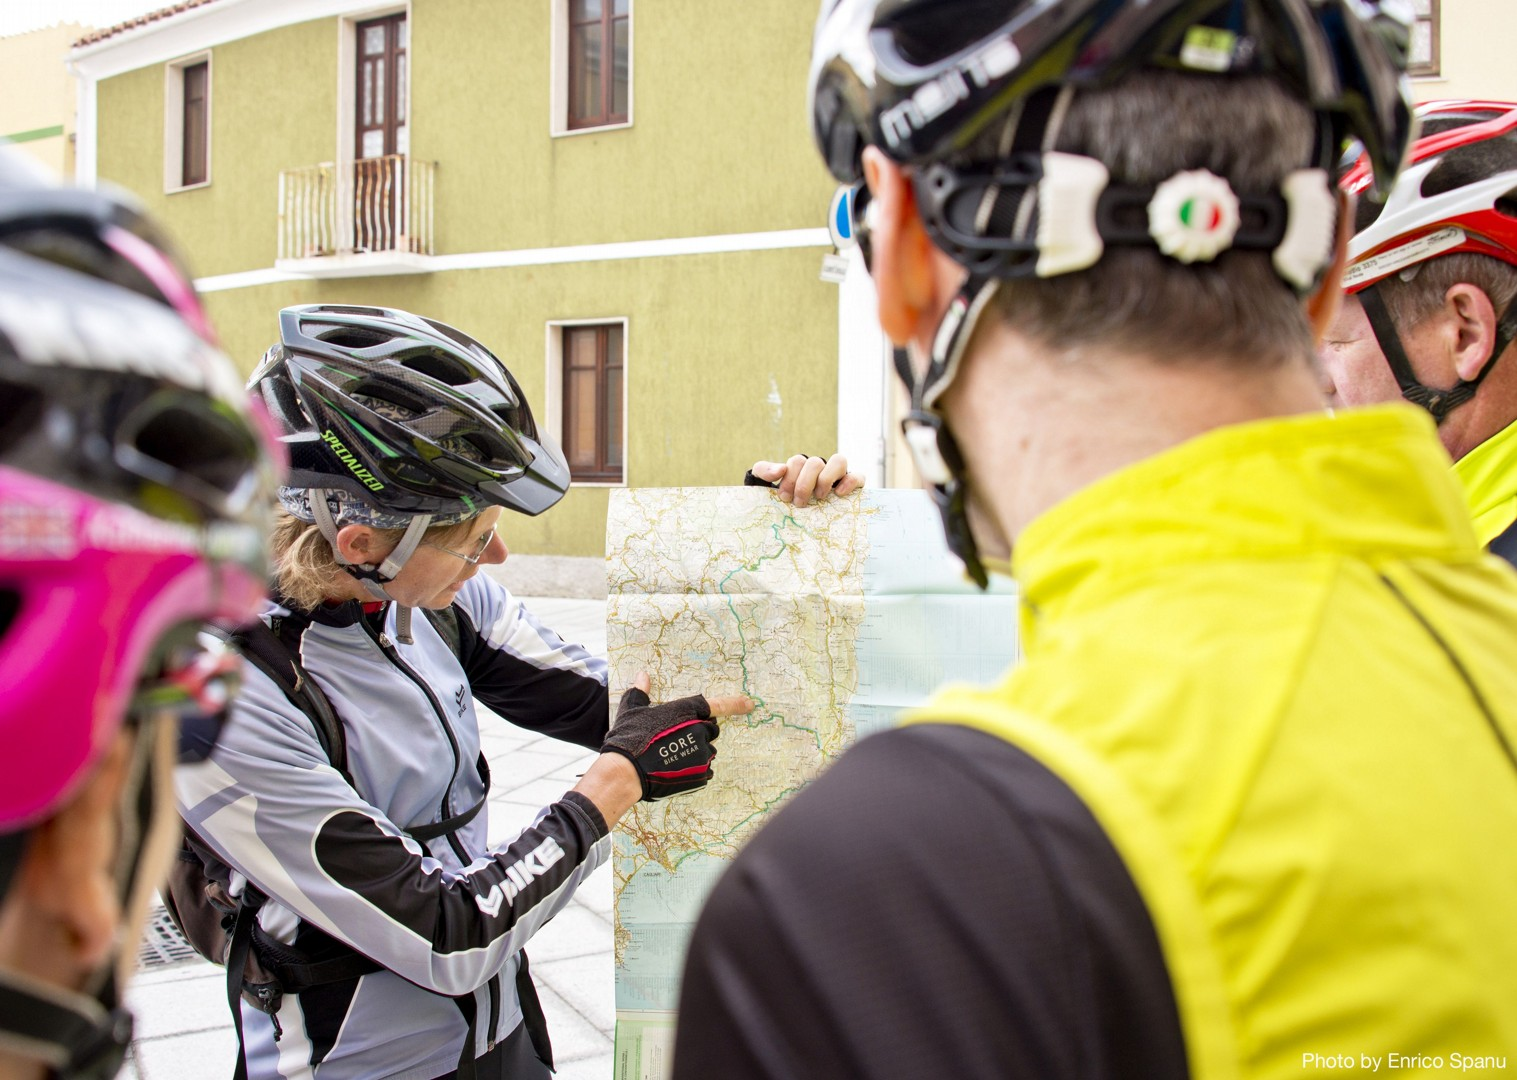 Guided-Road-Cycling-Holiday-Sardinia-Sardinian-Mountains.jpg - Italy - Sardinia - Mountain Explorer - Guided Road Cycling Holiday - Italia Road Cycling